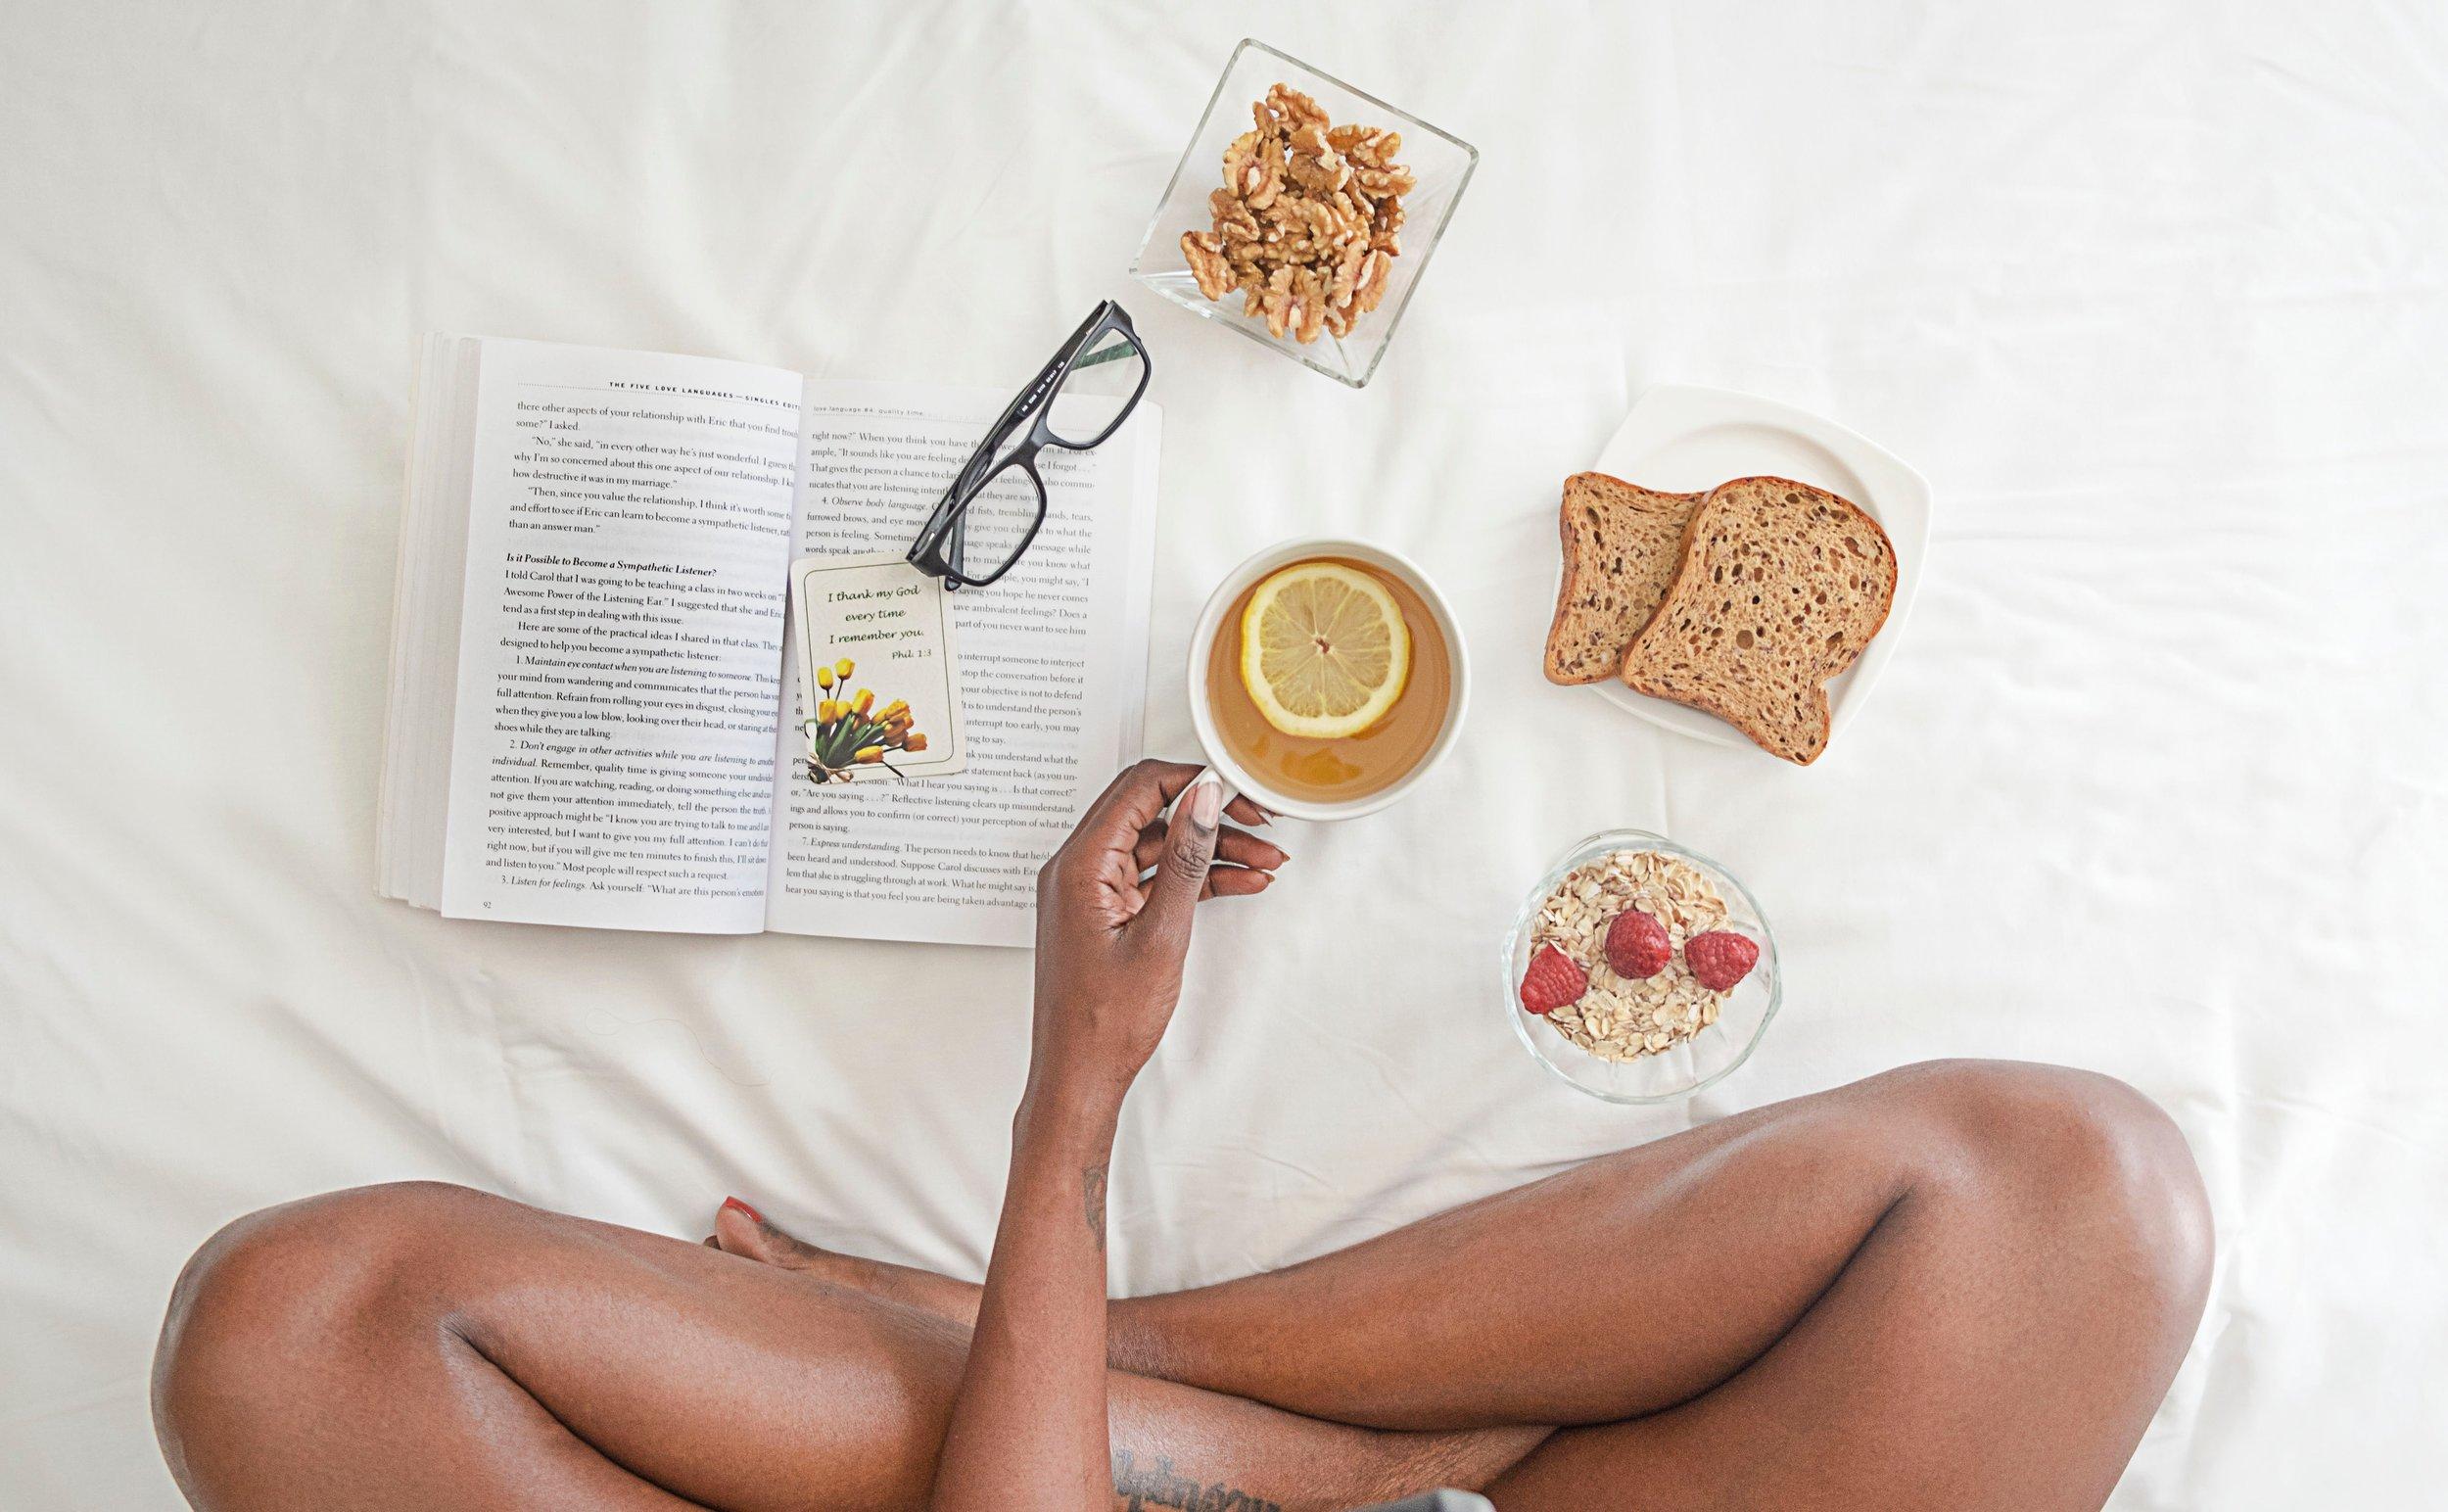 bed-book-breads-1065588.jpg